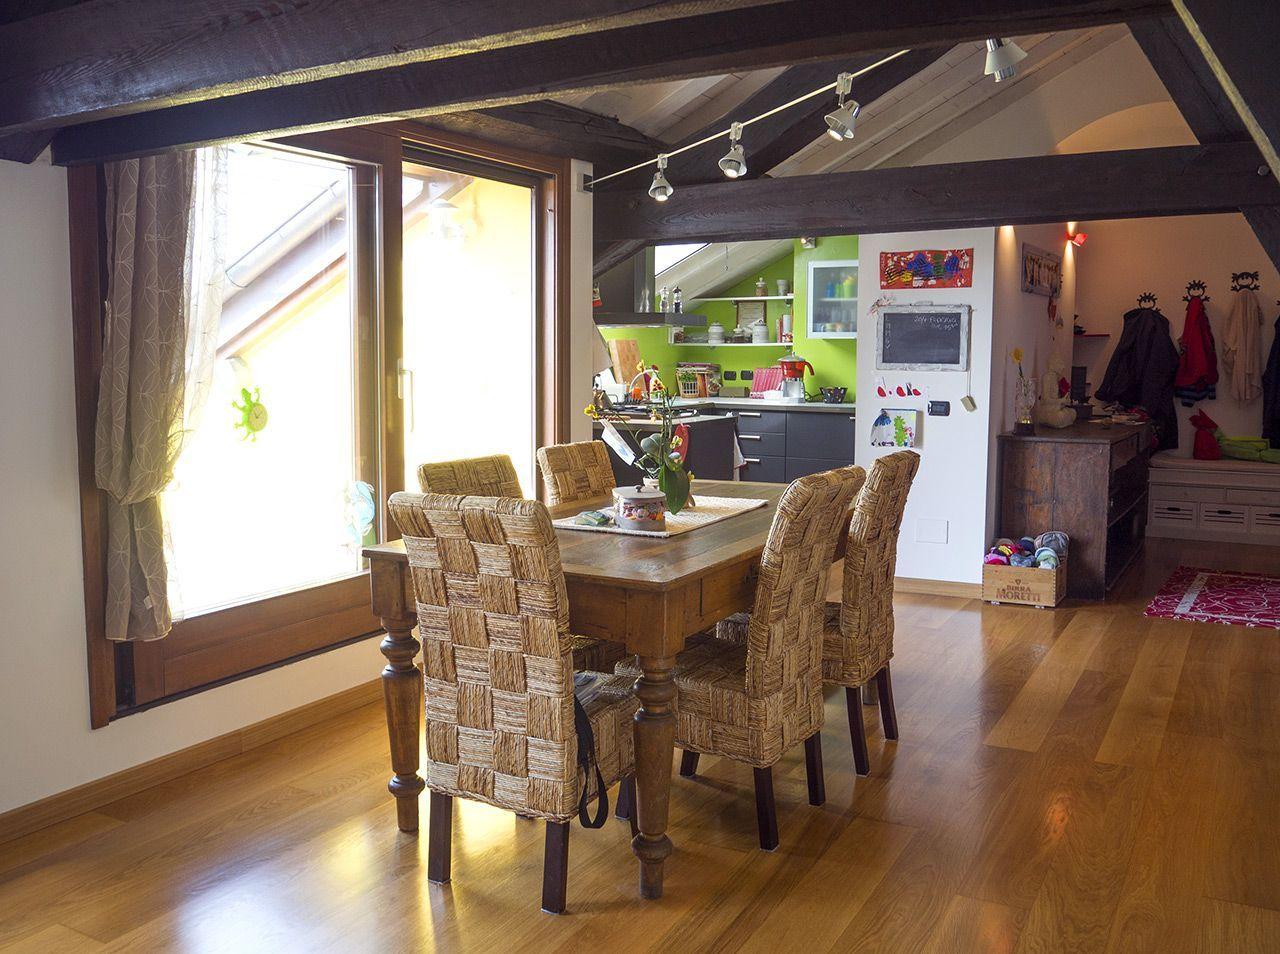 Three-room apartment in Verbania - living room